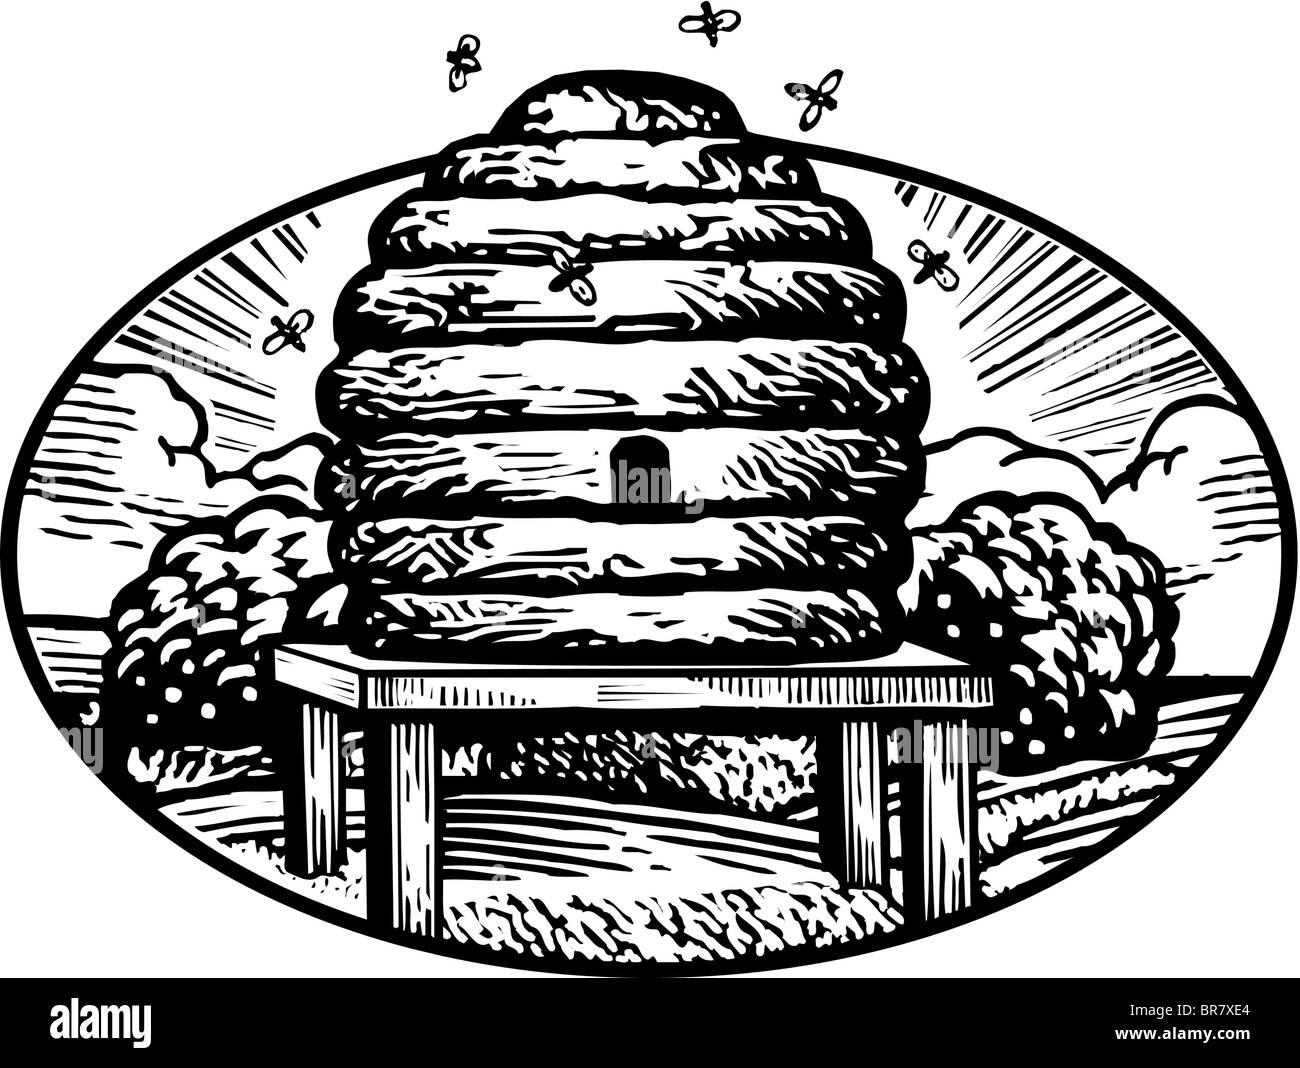 Bee Hive Illustration Imágenes De Stock & Bee Hive